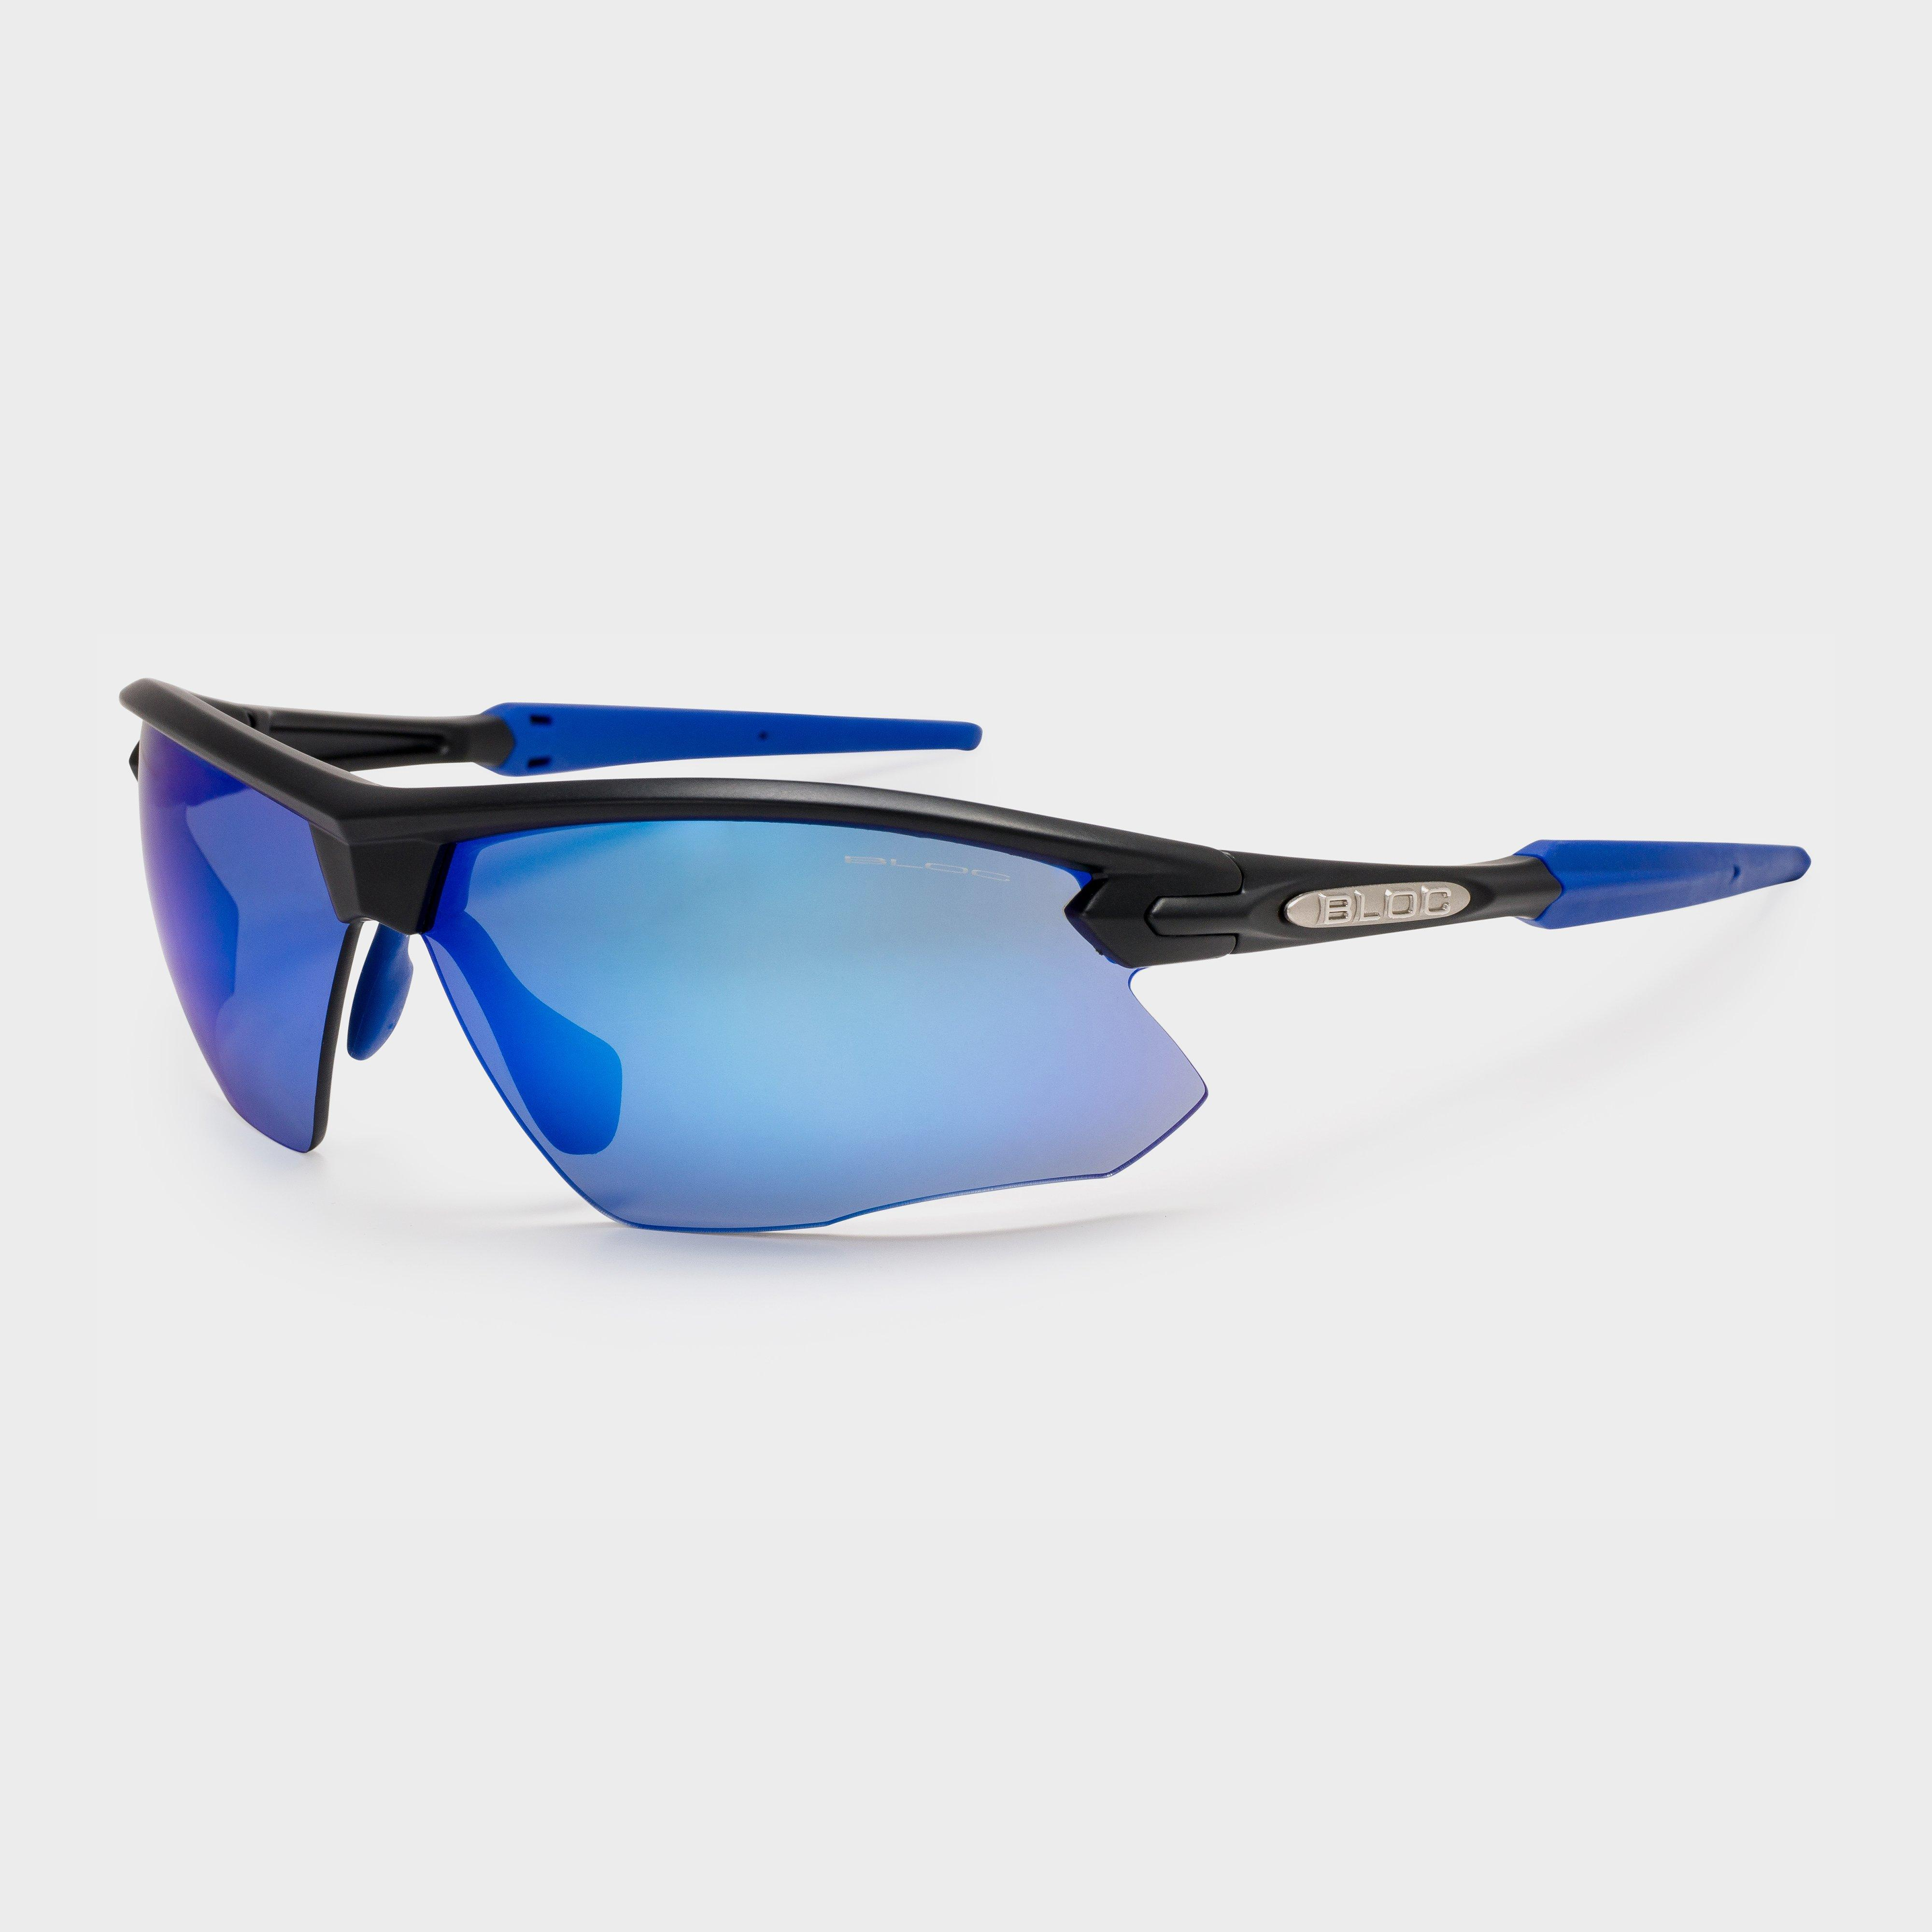 Bloc Fox Xb760 Sunglasses - Blue/black  Blue/black